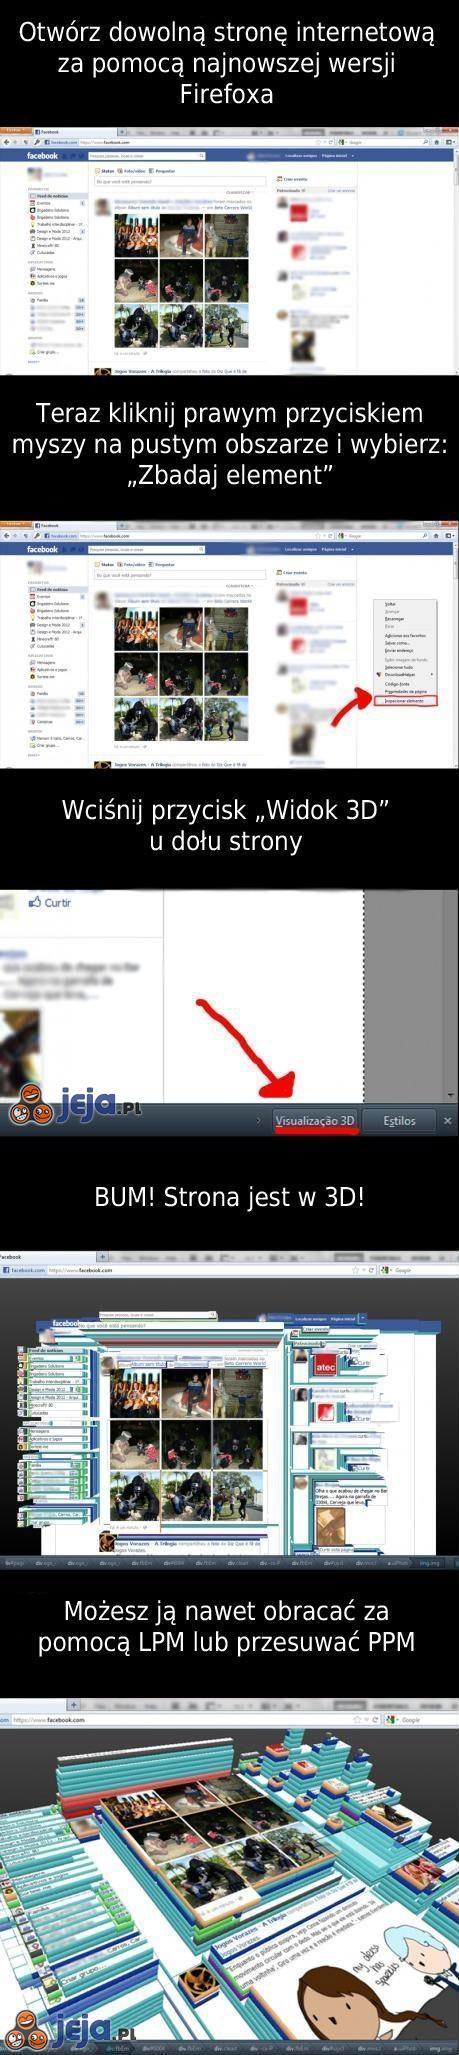 Firefox w 3D!